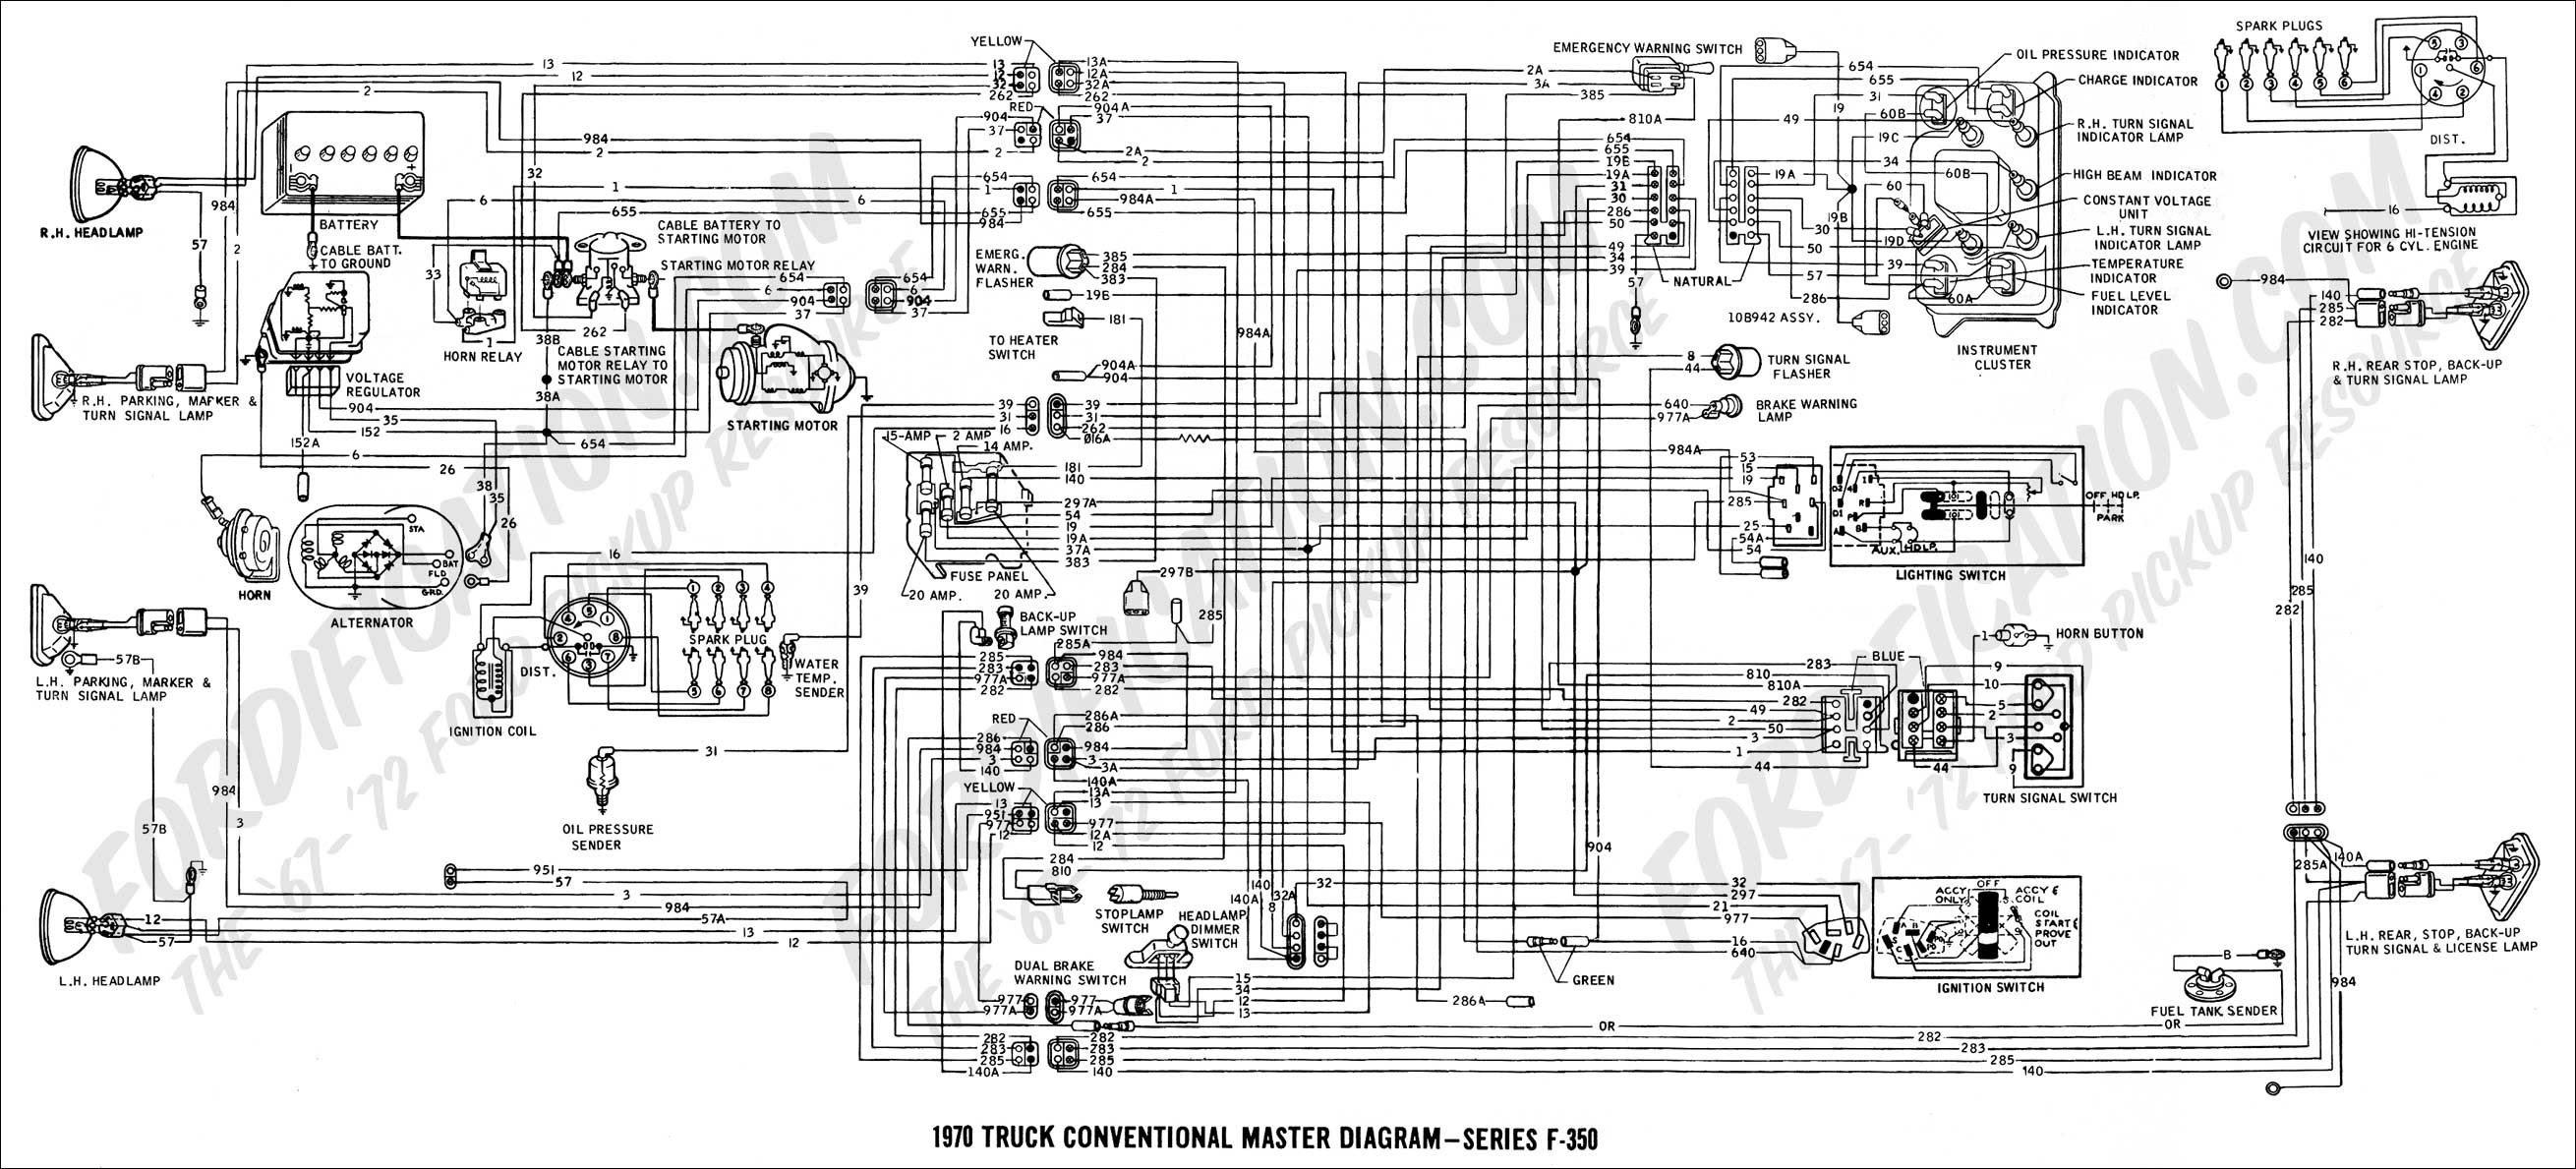 1997 Ford Ranger Engine Diagram Kobelco Wiring Diagram Sk21 Cheerokee 2014ok Jeanjaures37 Fr